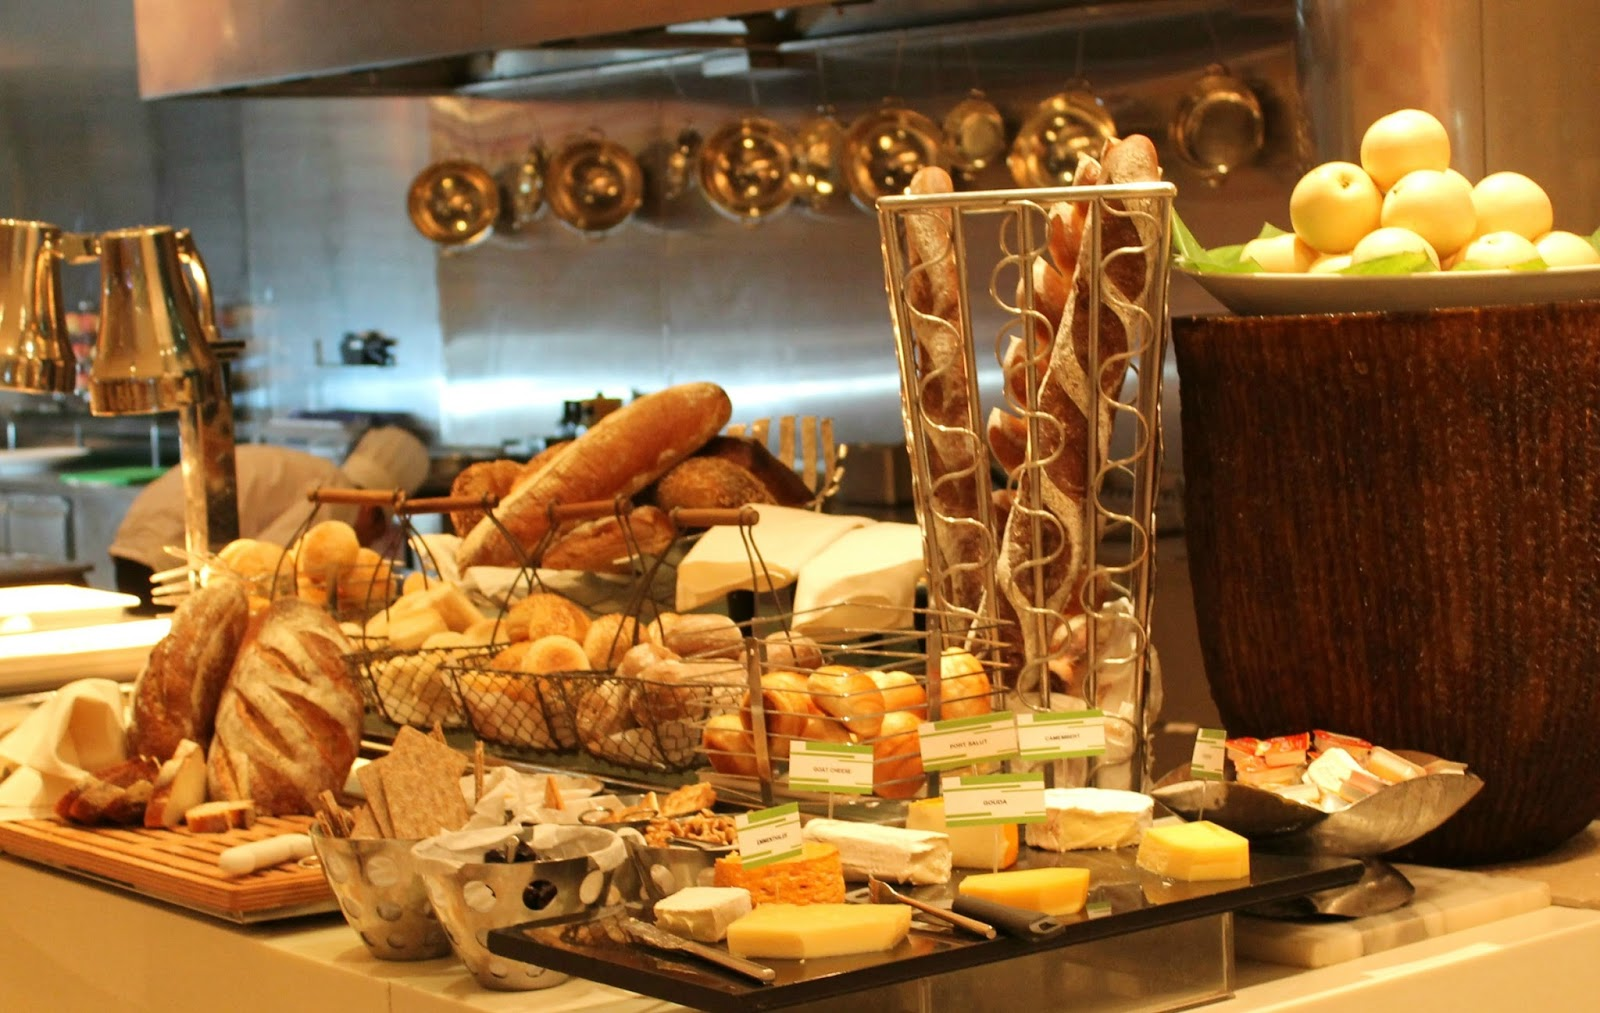 Megan seafood buffet lemon garden shangri la kl - Can i eat port salut cheese when pregnant ...